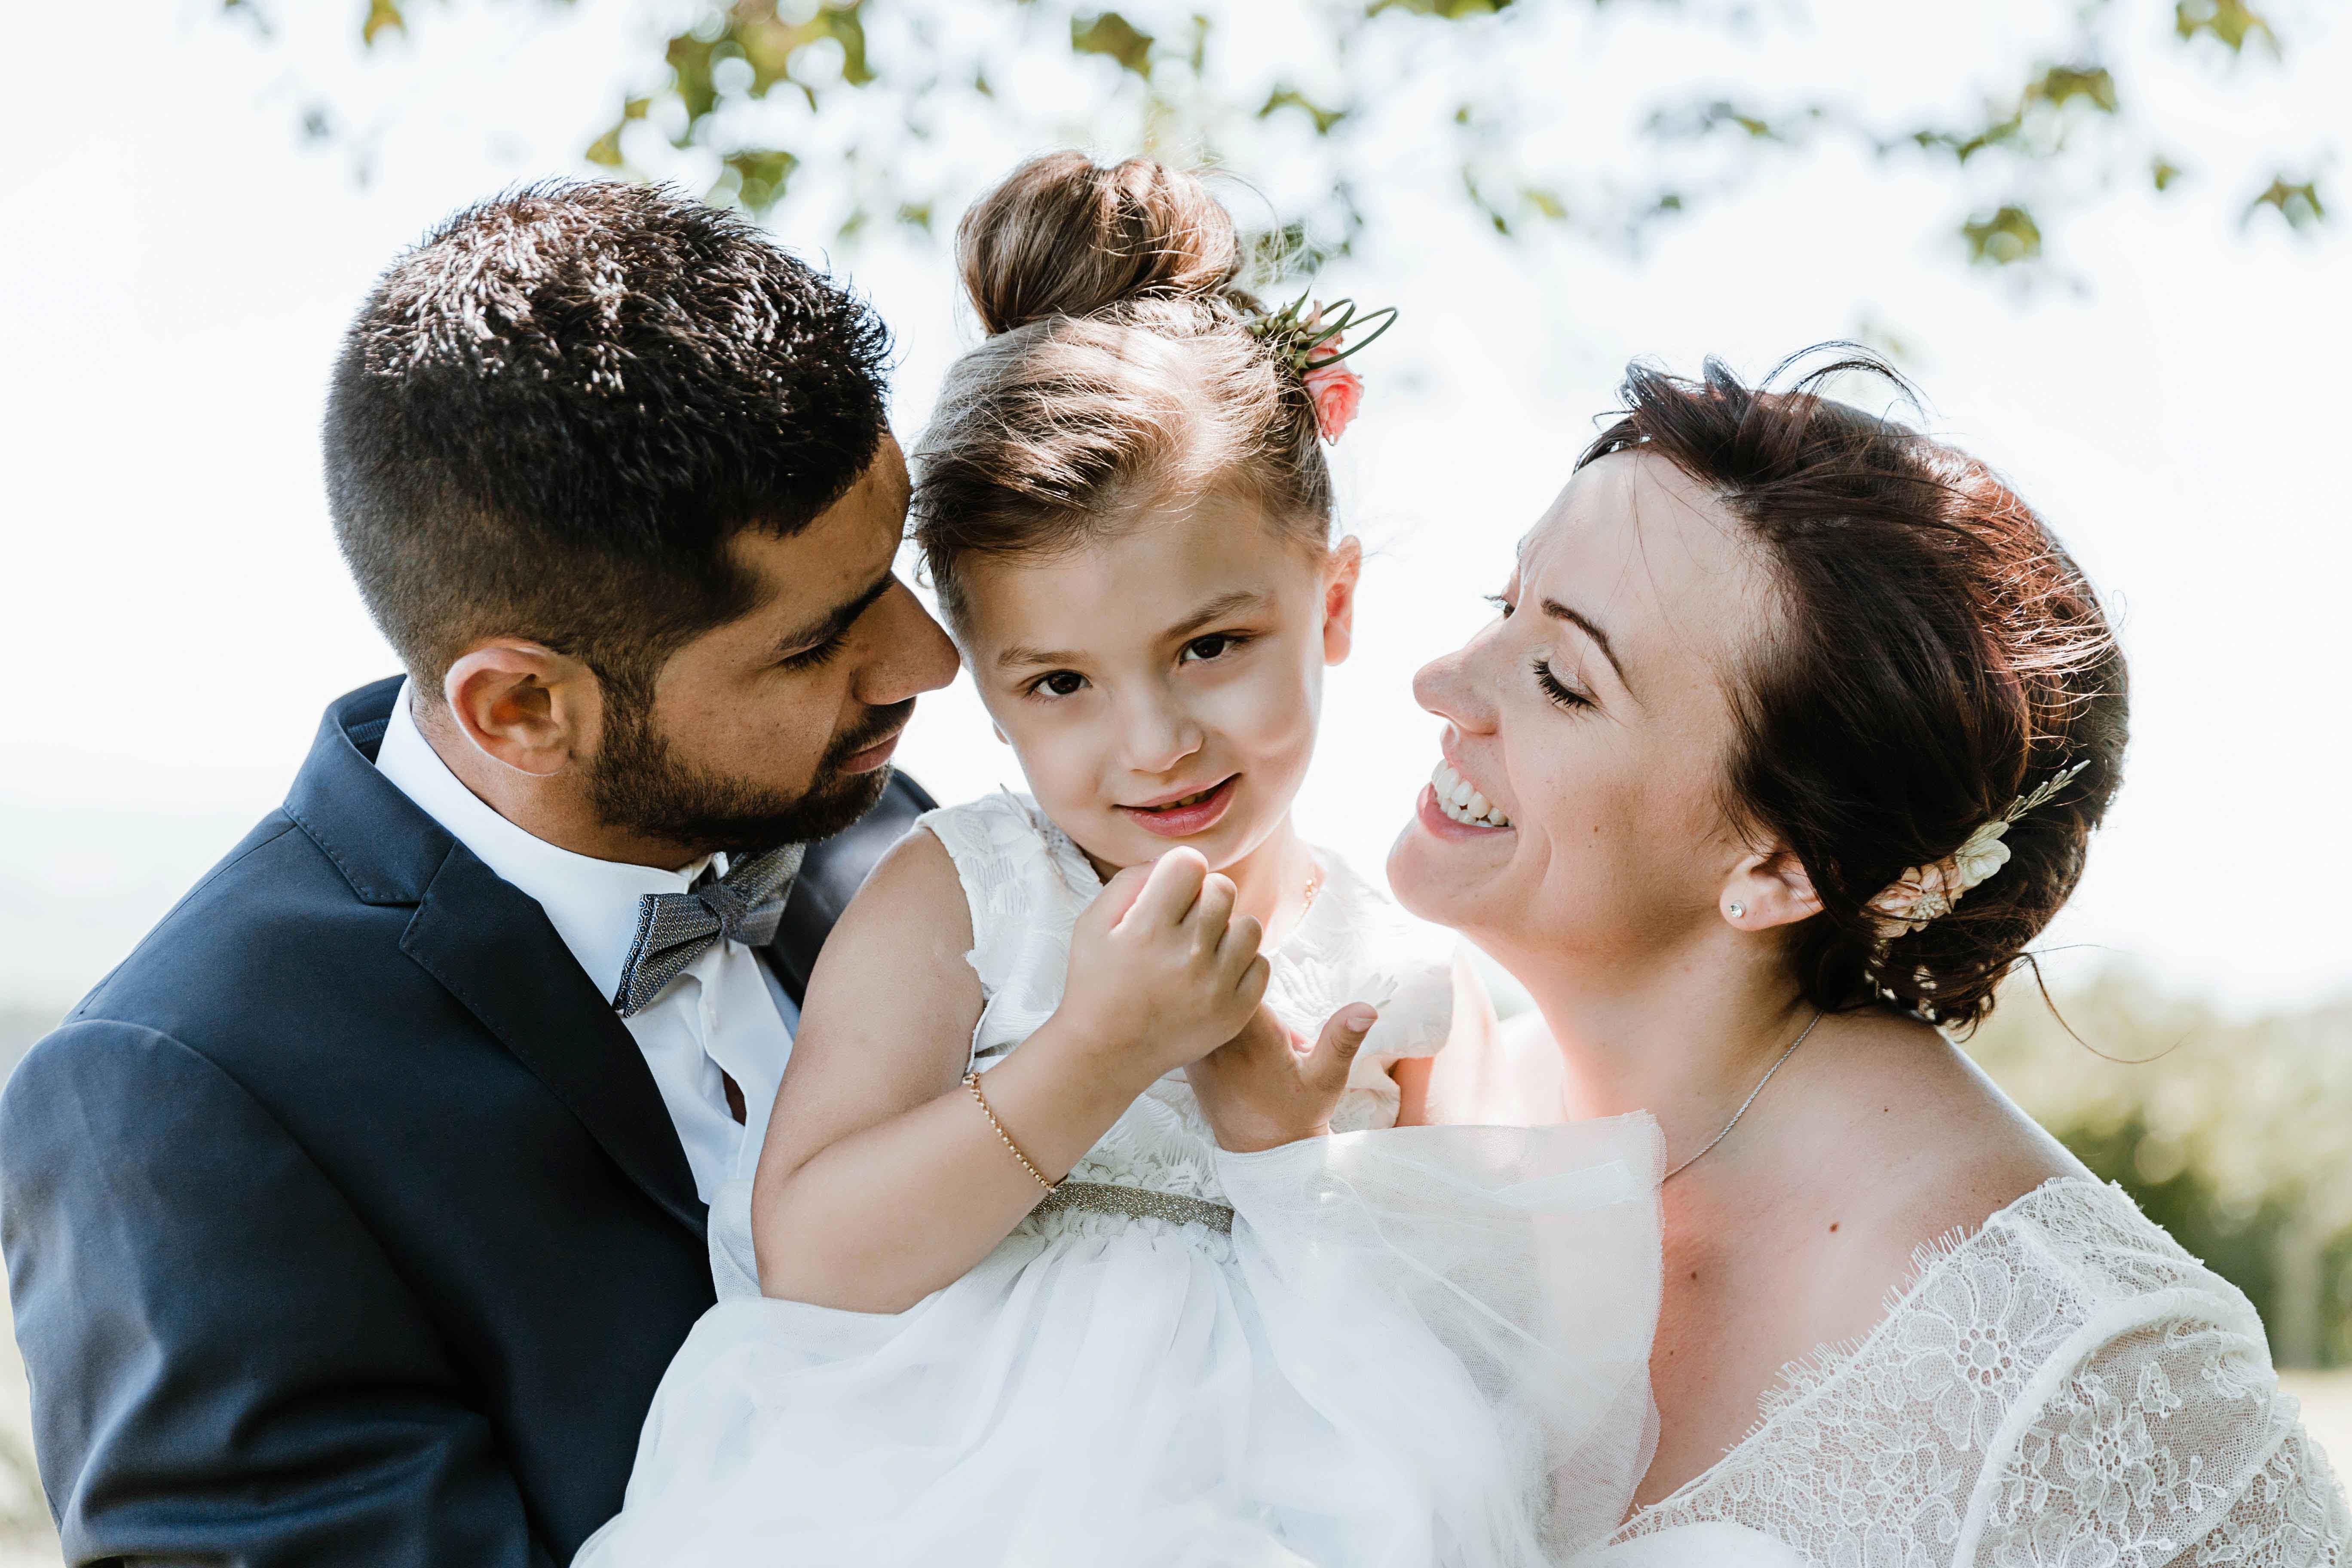 photographe beaujolais lyon love enfant mariage